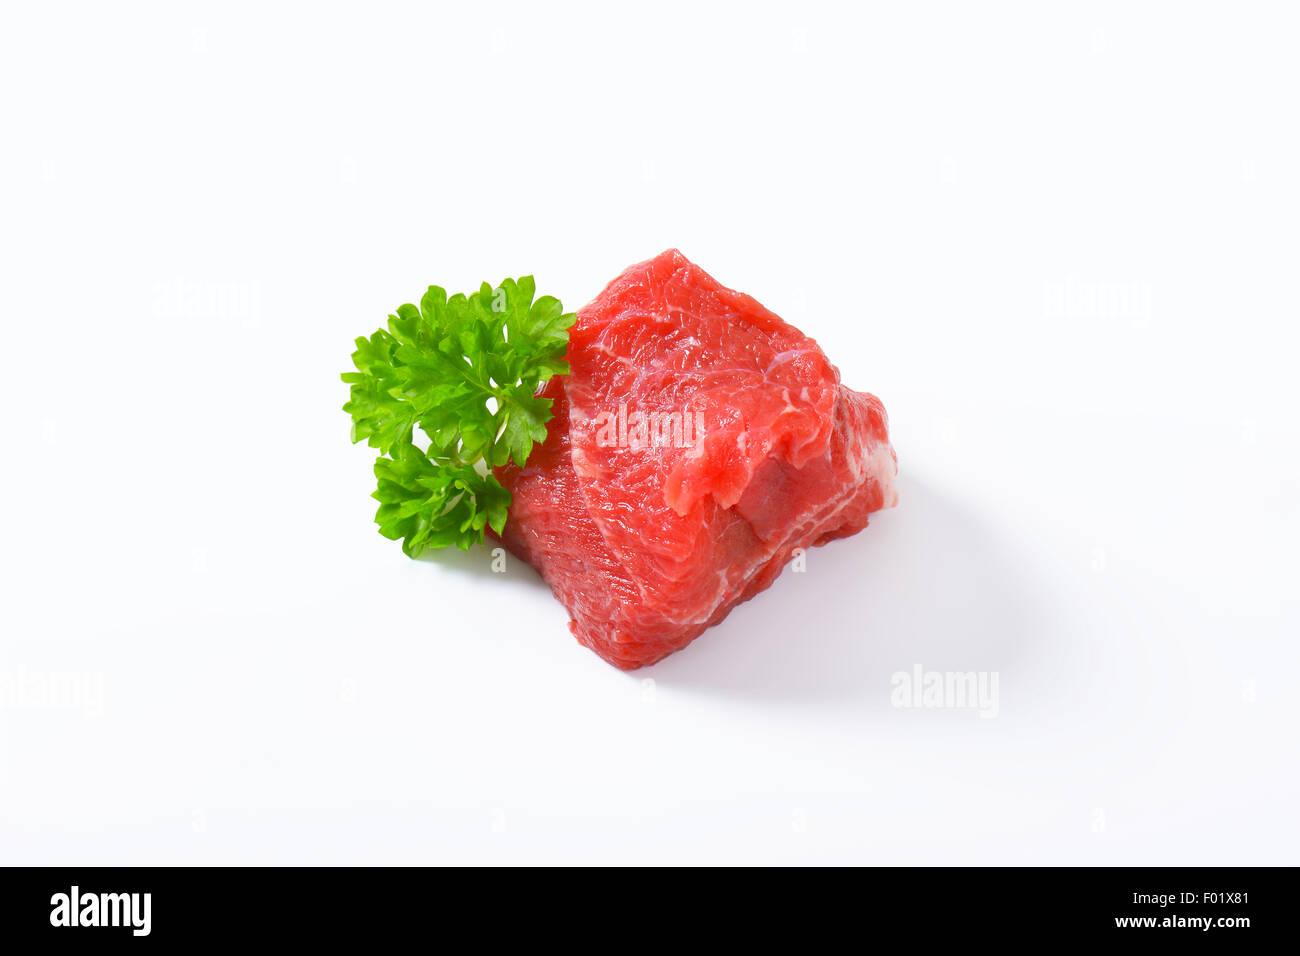 Chunk of raw beef steak - Stock Image